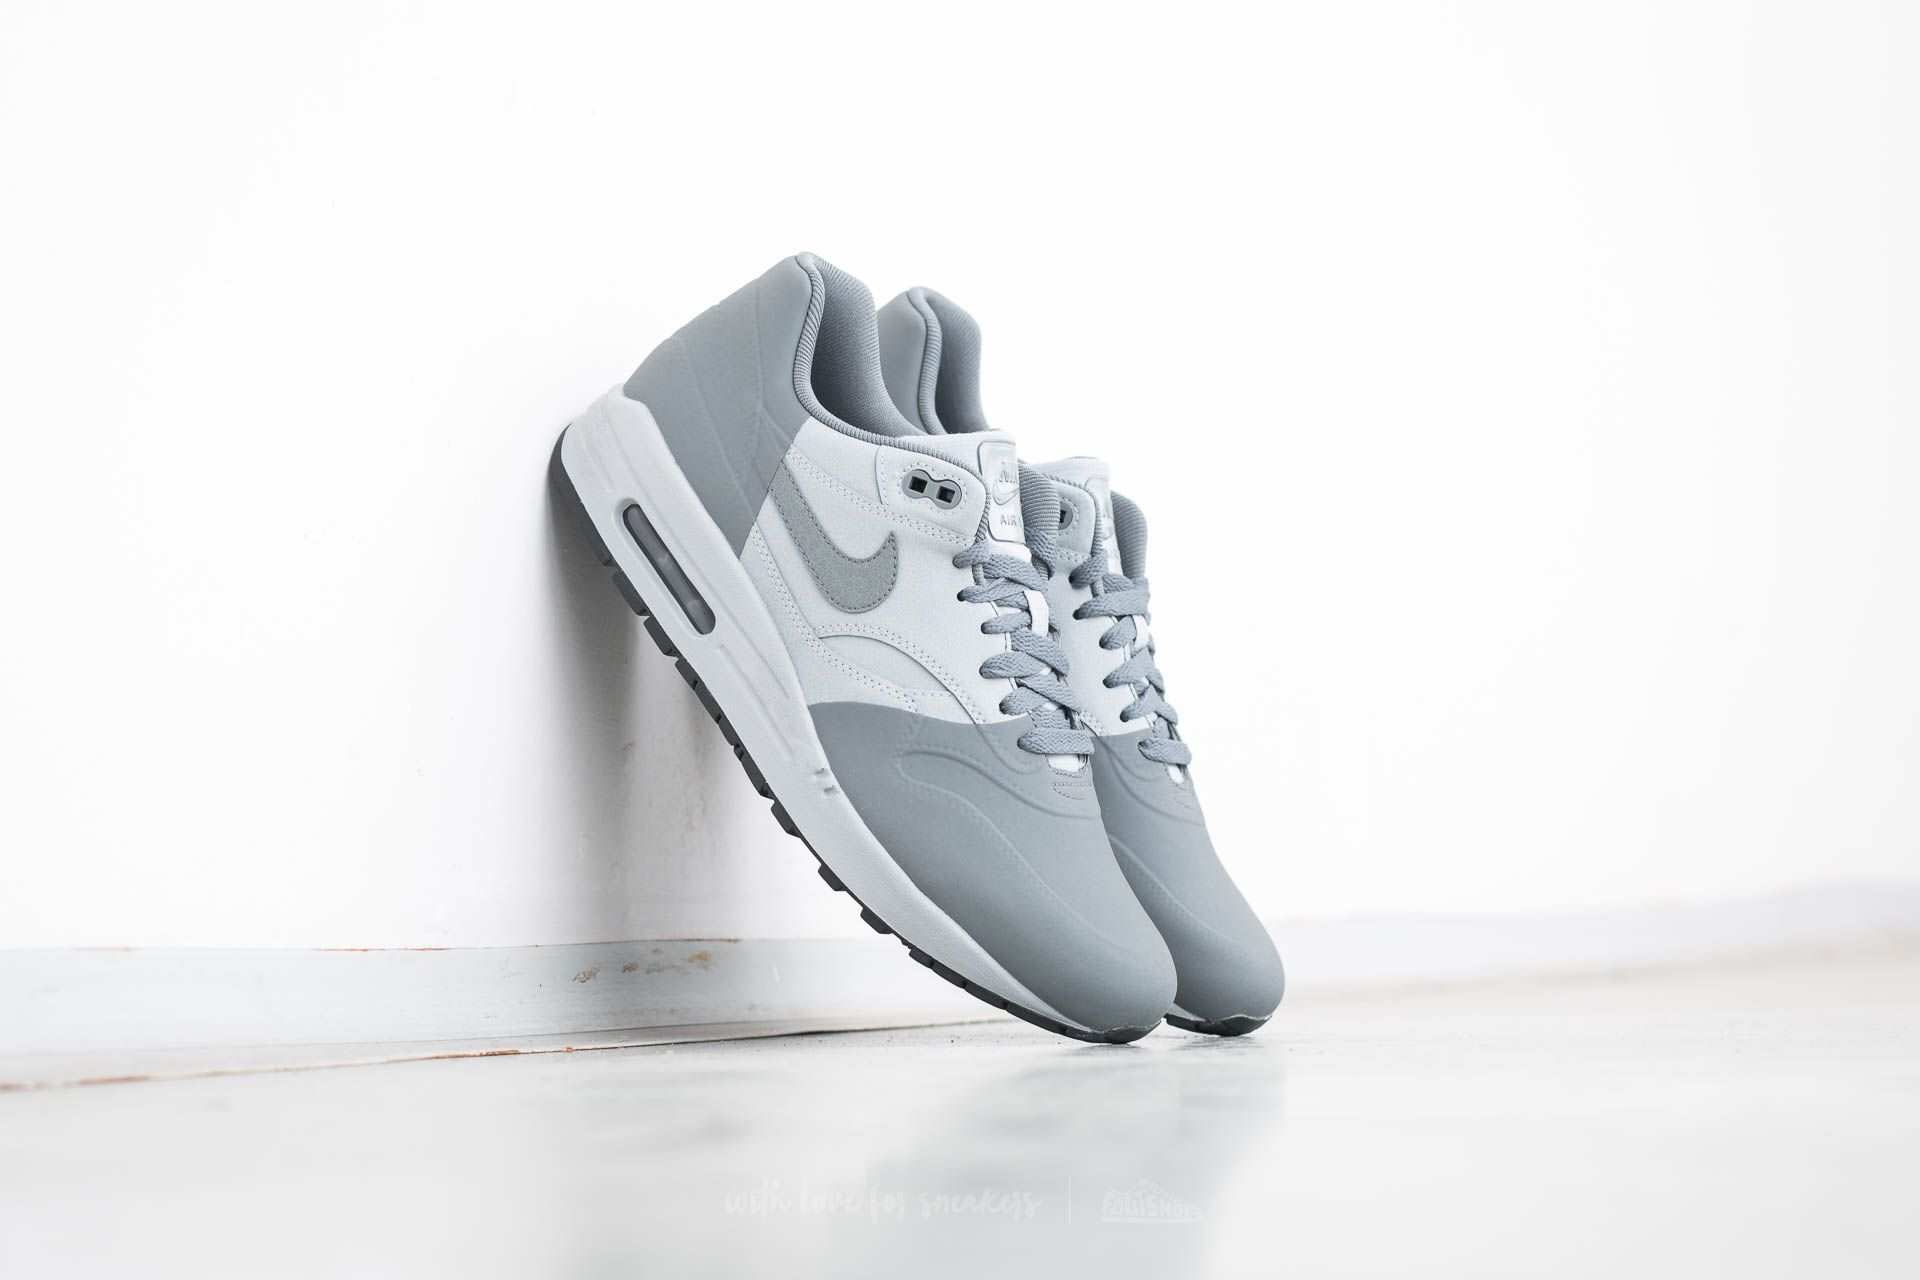 finest selection a582c 40b4f Nike Air Max 1 Premium SE